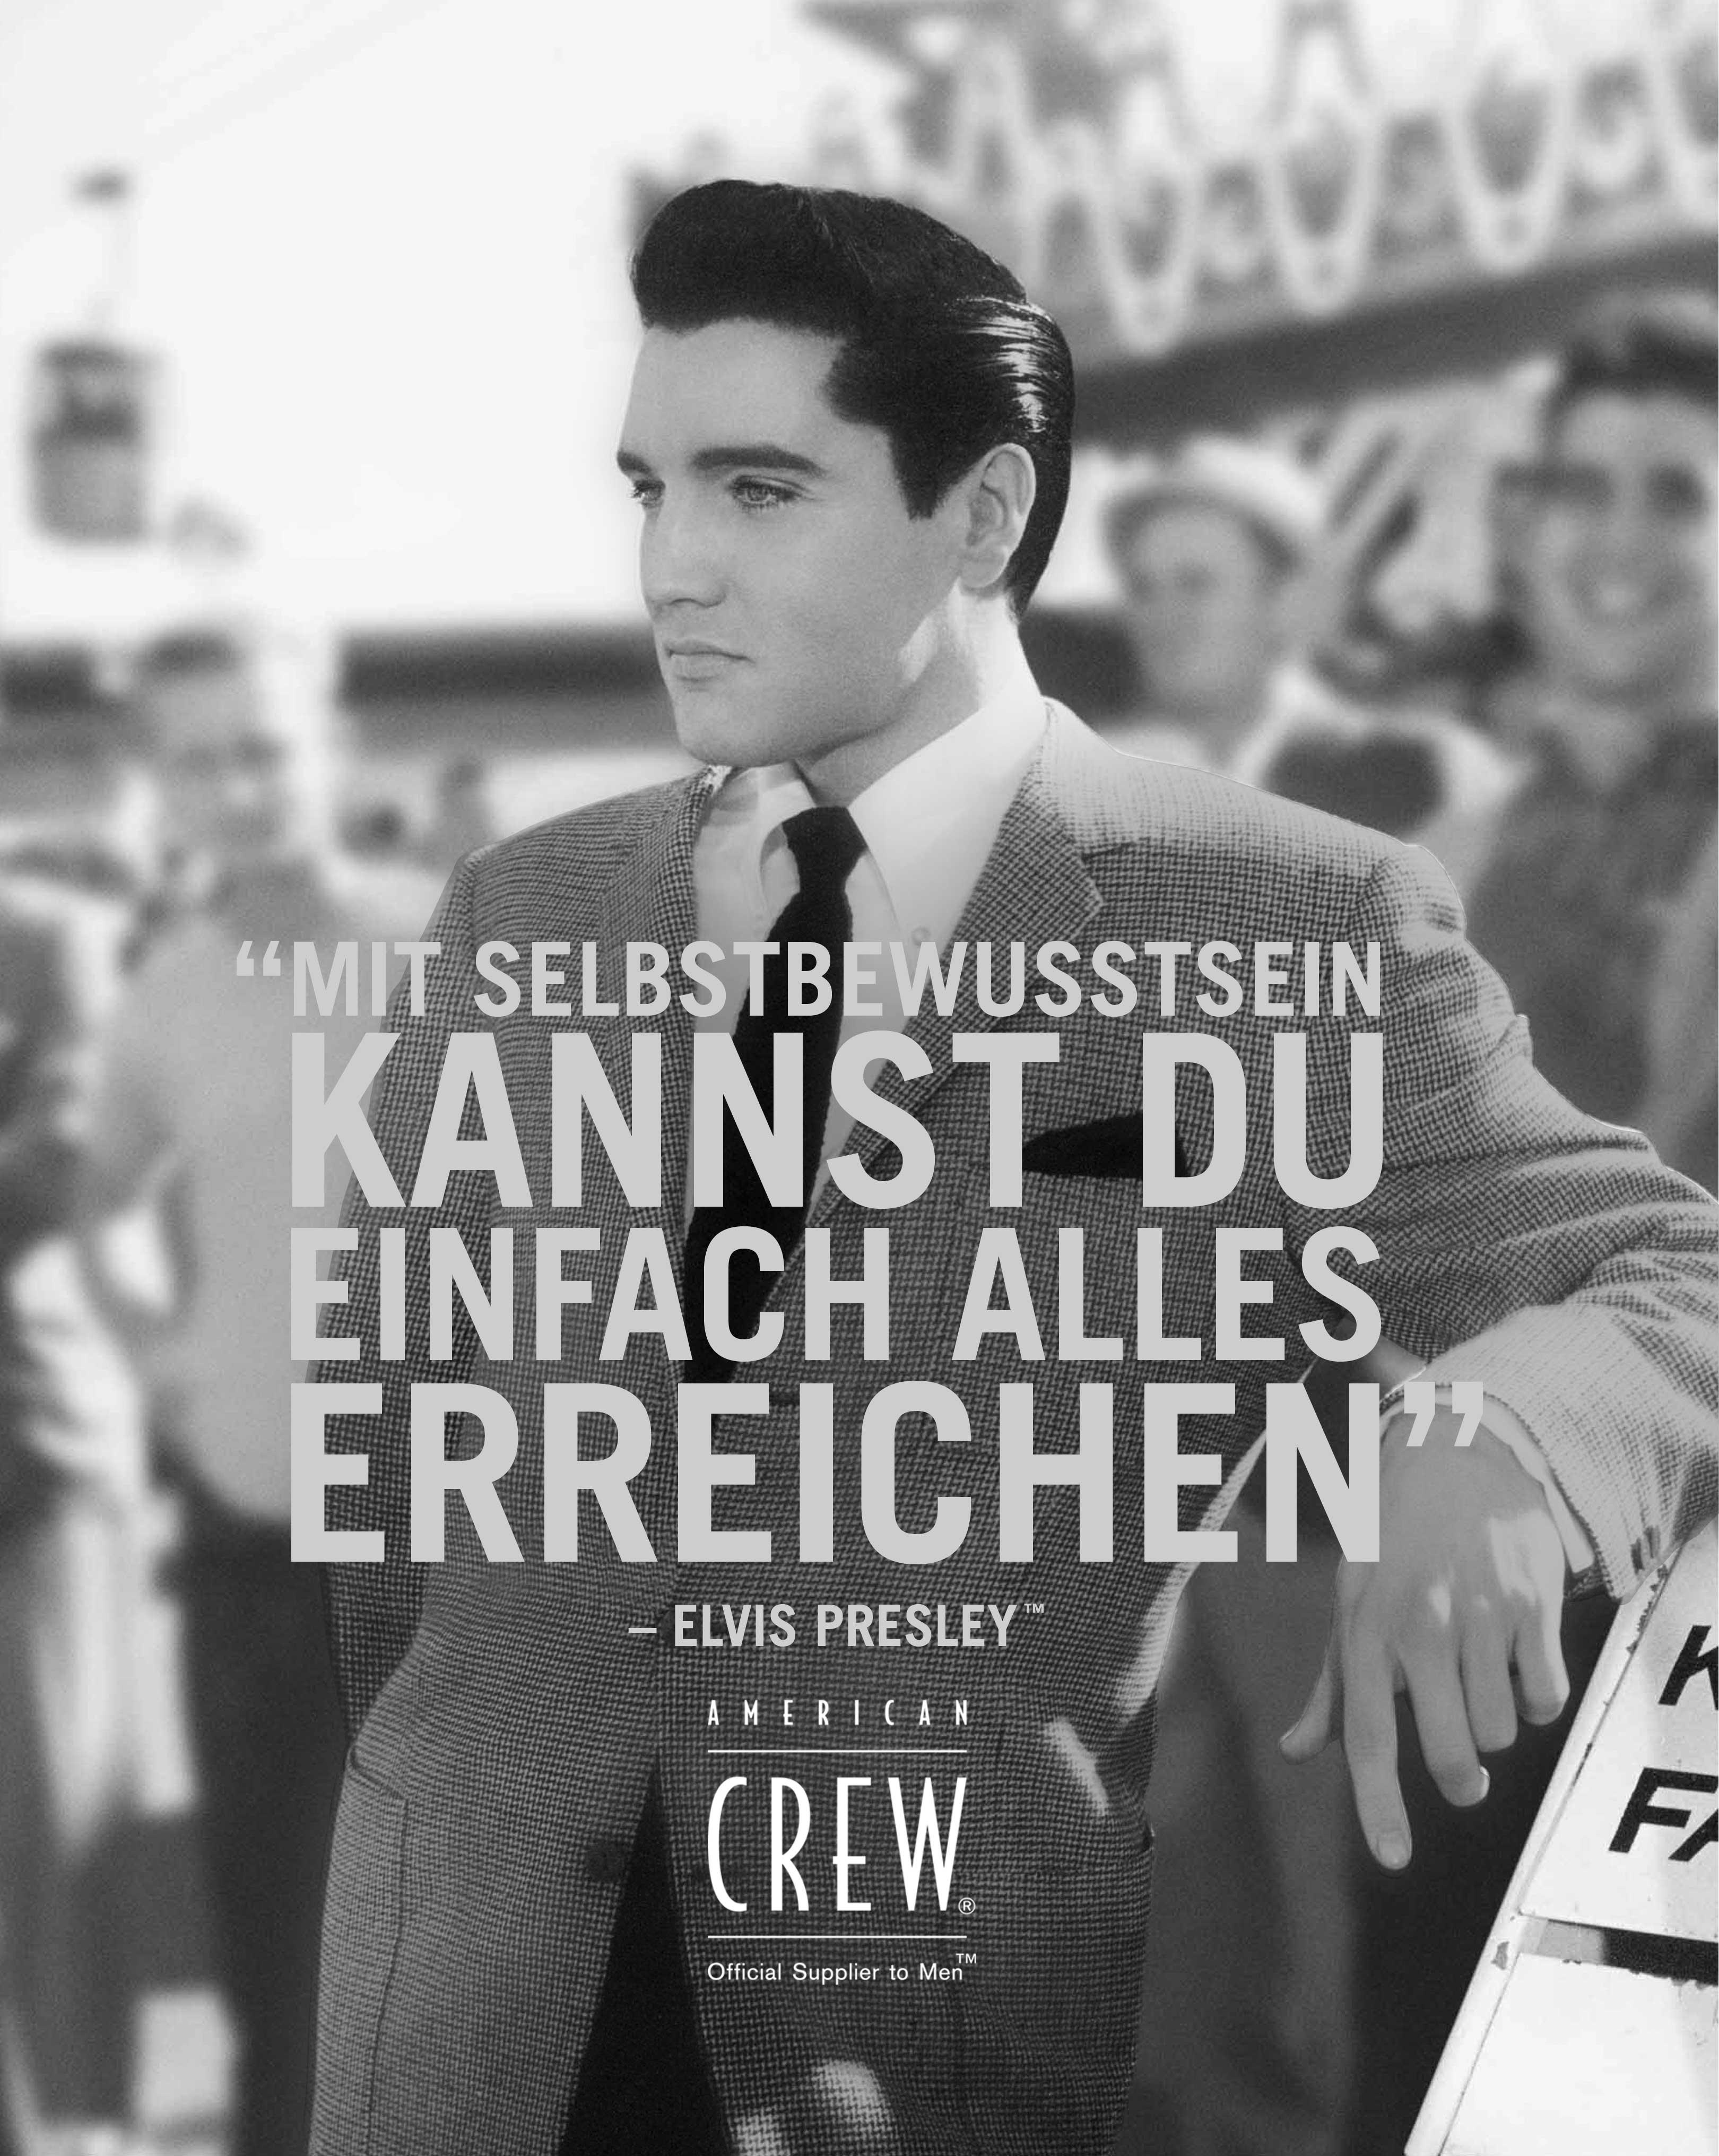 American Crew: Elvis presley